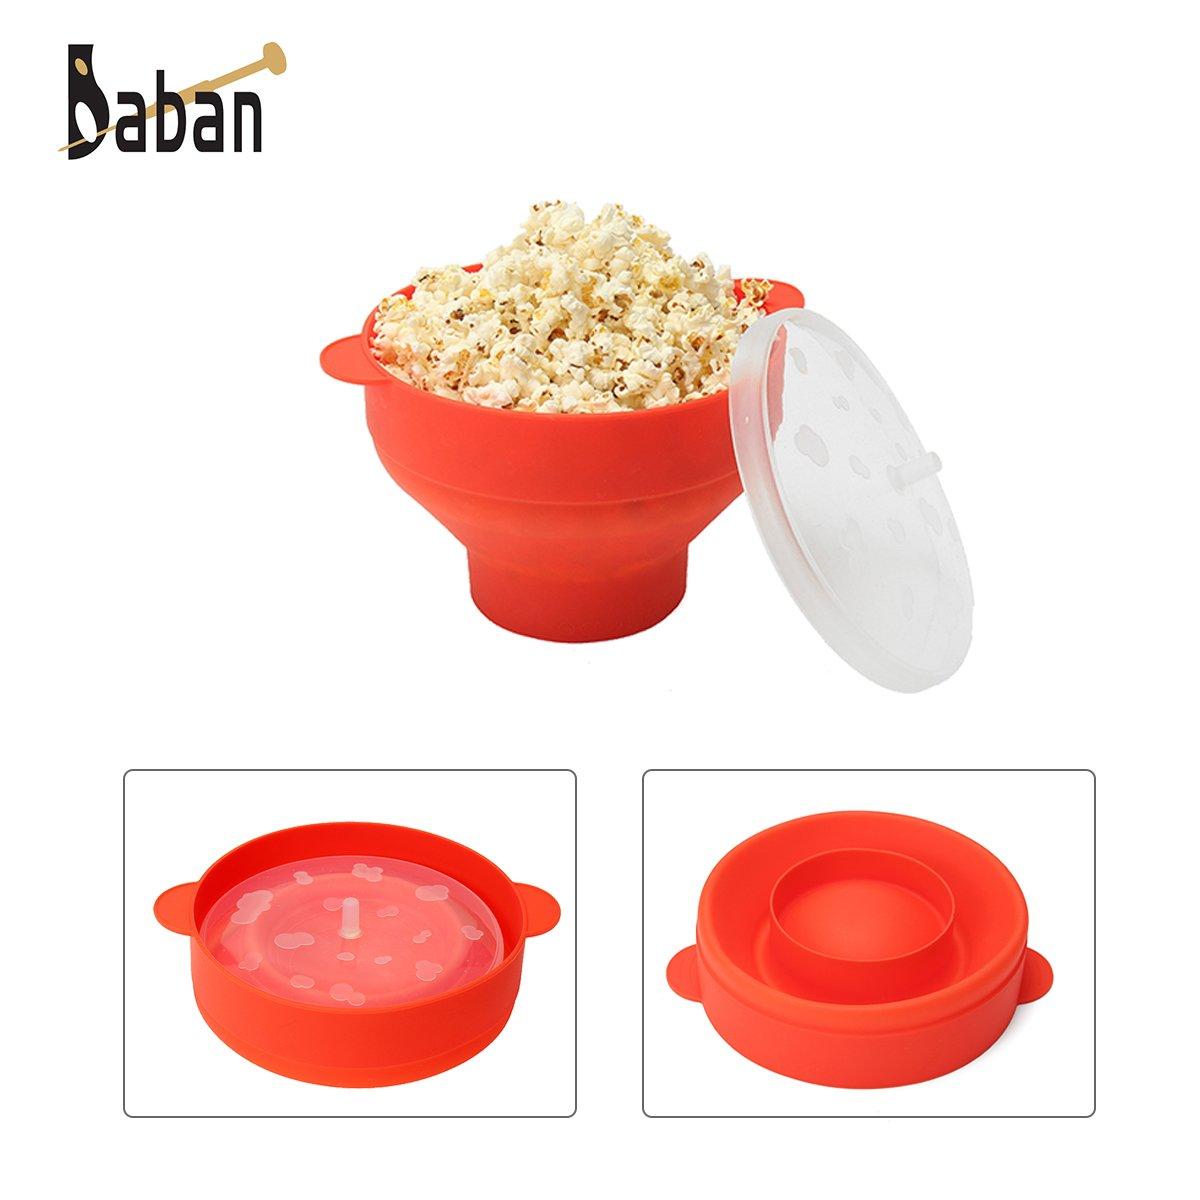 Baban - Palomitero para microondas, con asas, color rojo ...